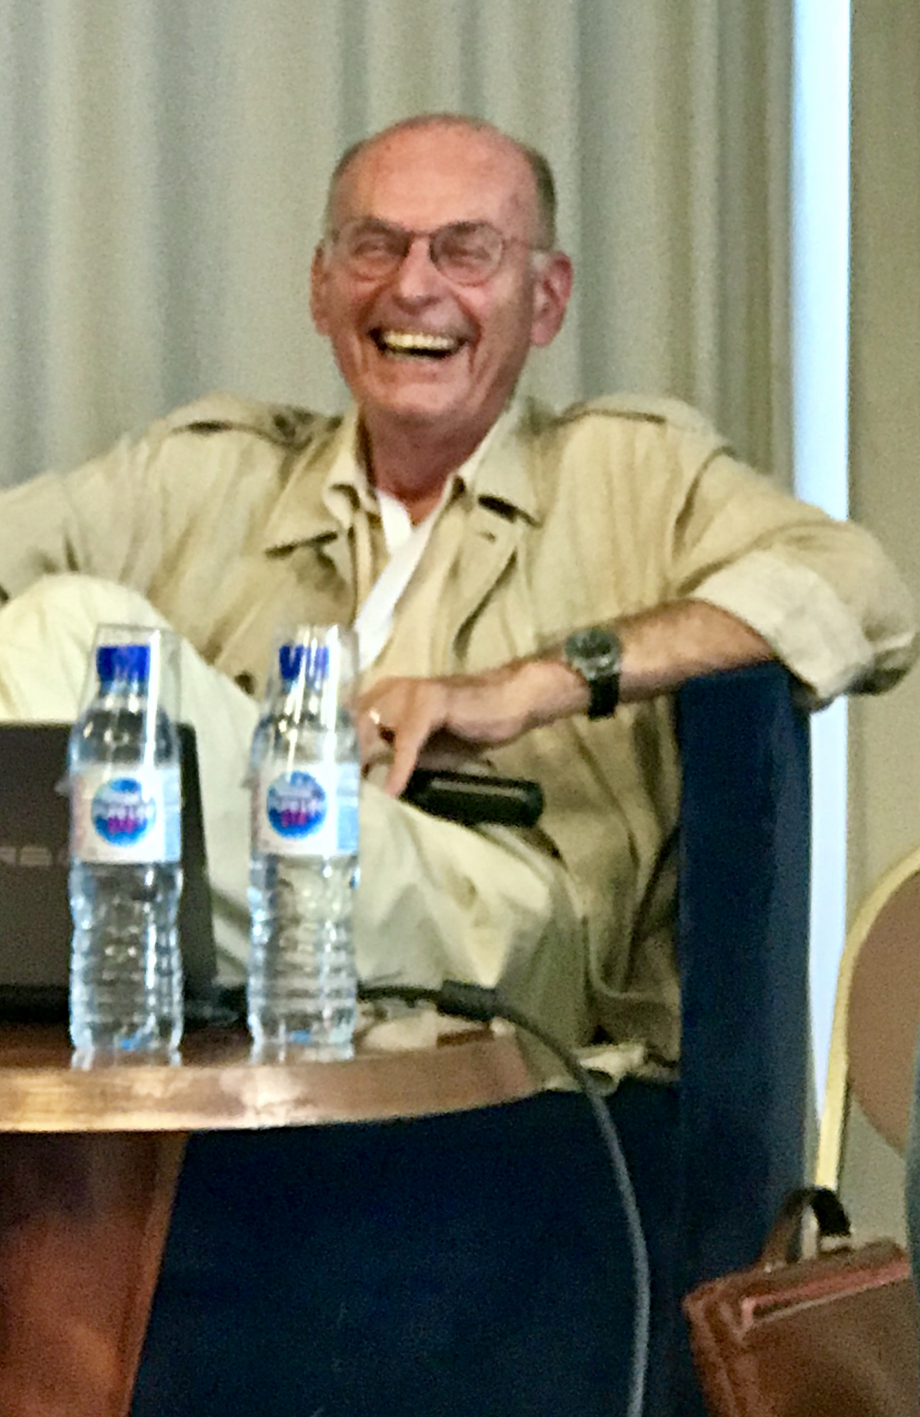 Boris Cyrulnik joyeux